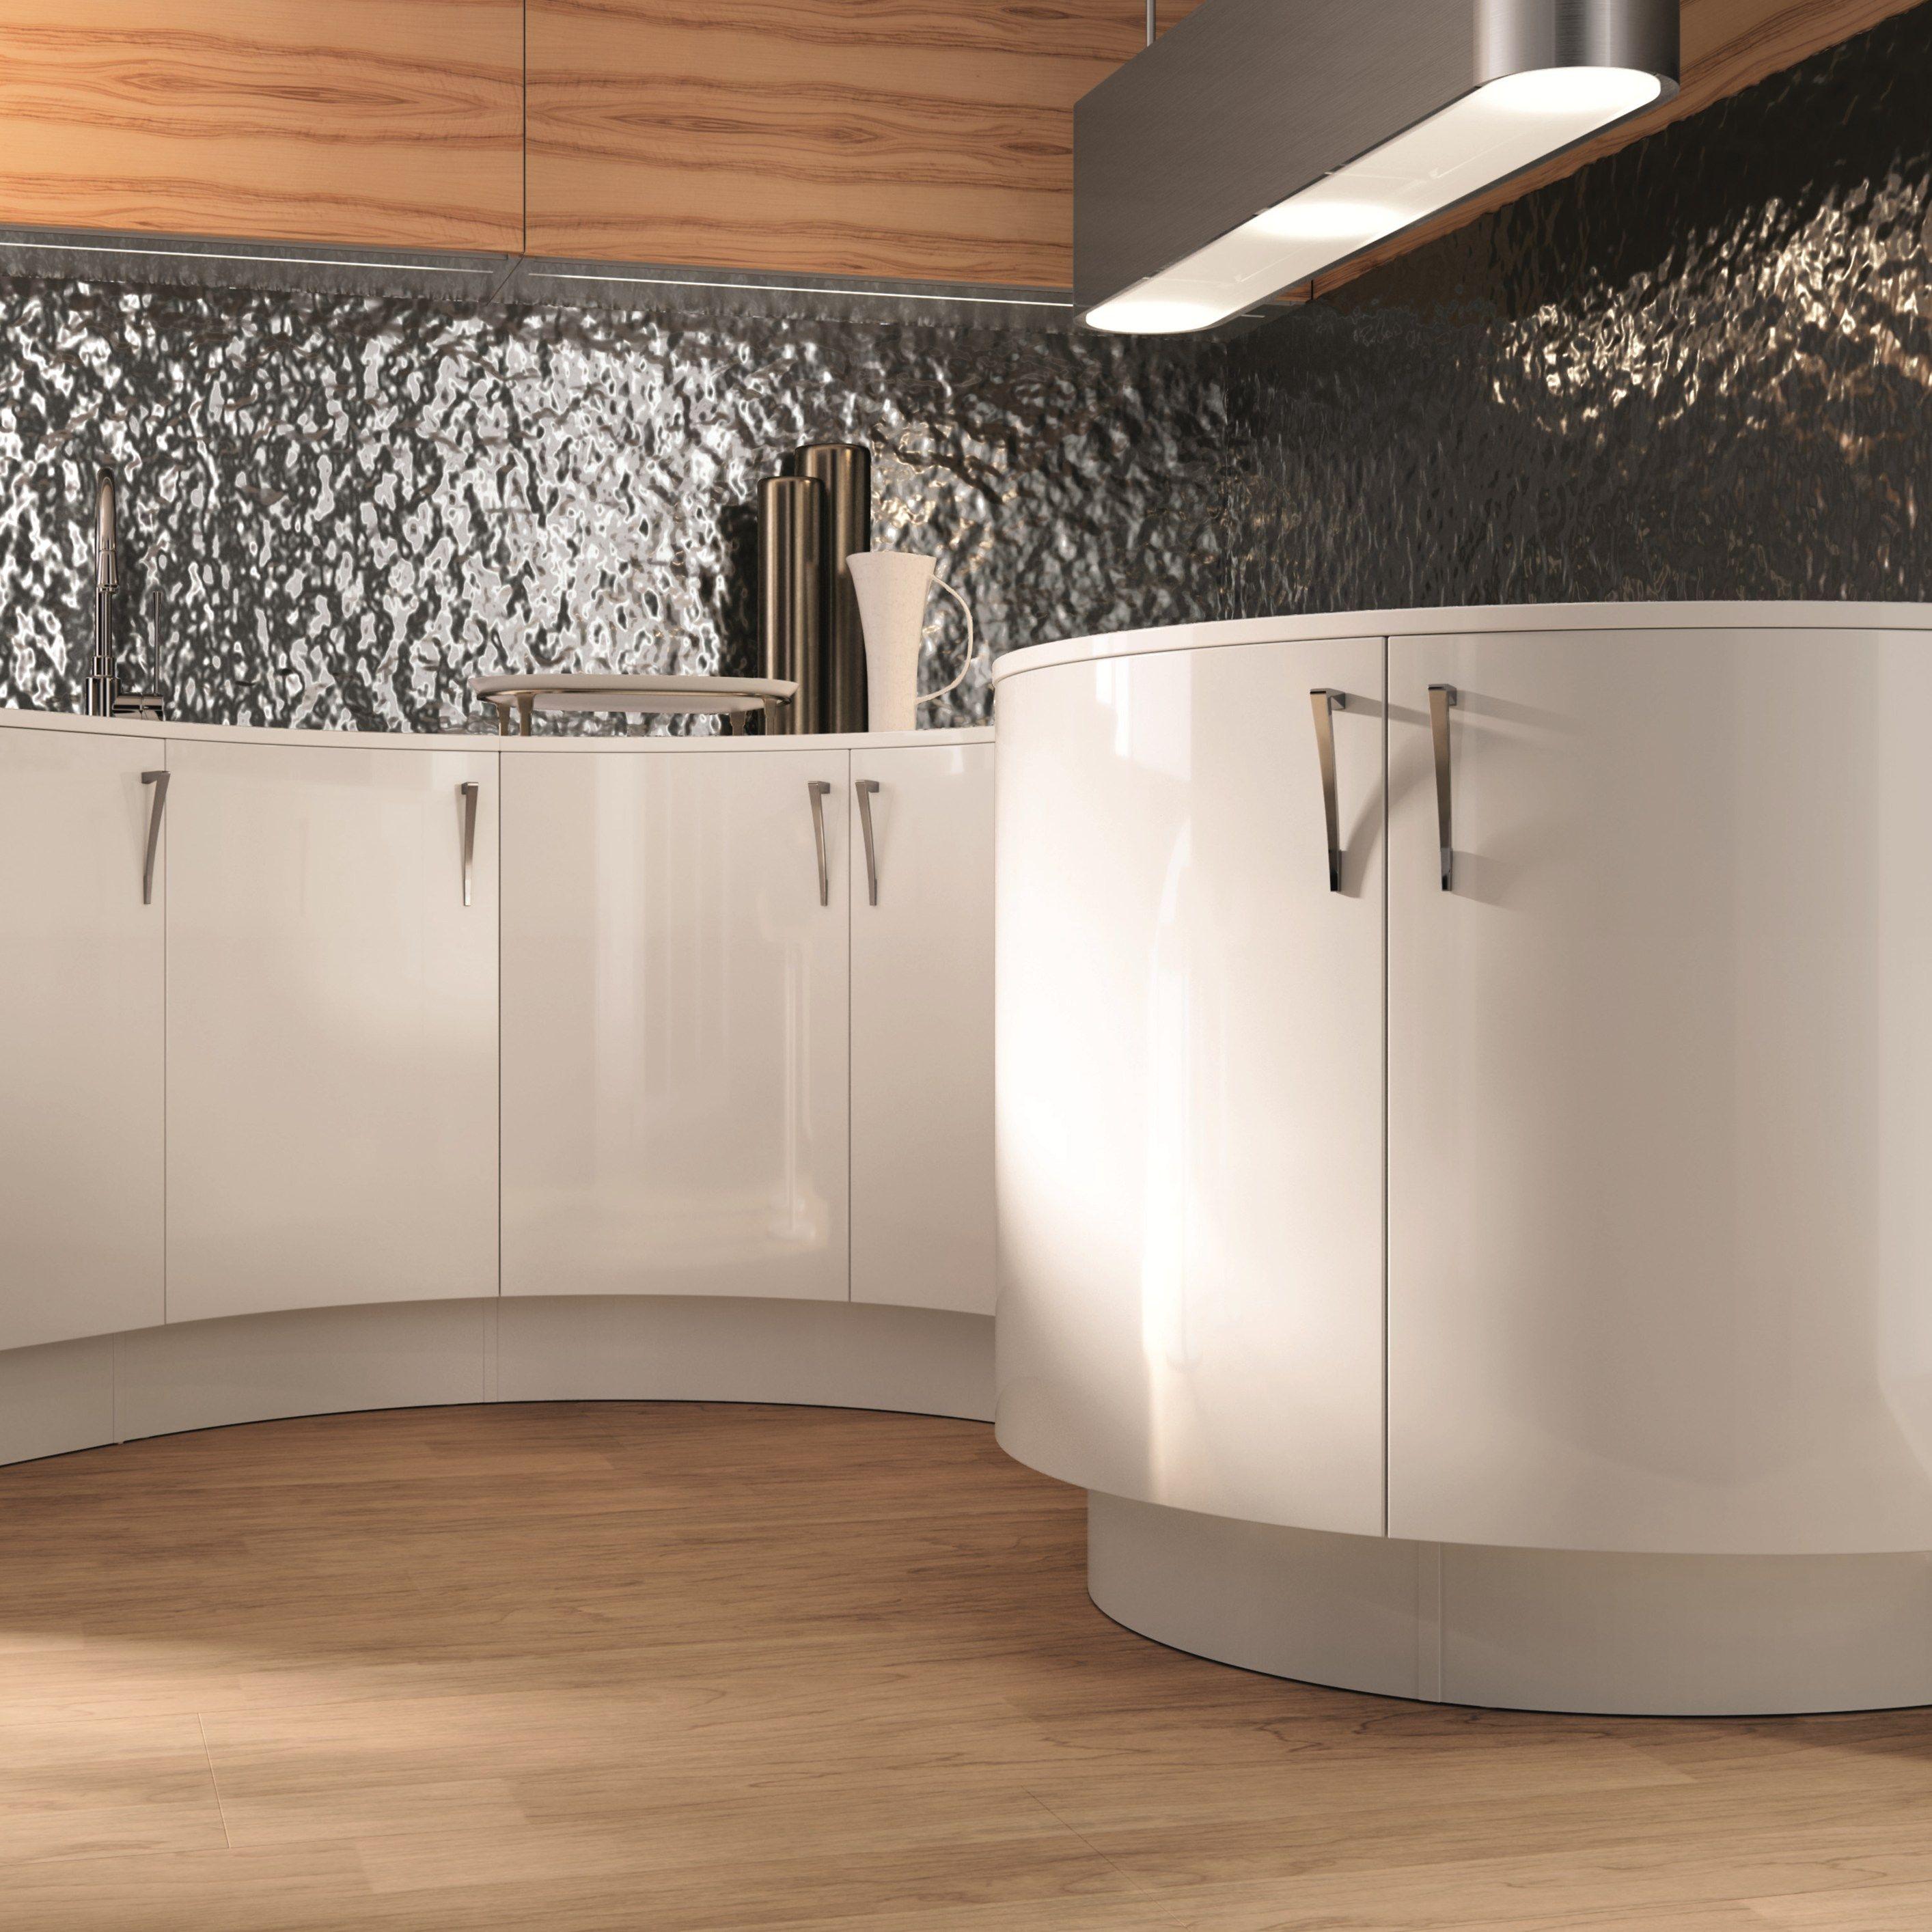 DOMINA | Kitchen With Peninsula By Aster Cucine Design Lorenzo Granocchia